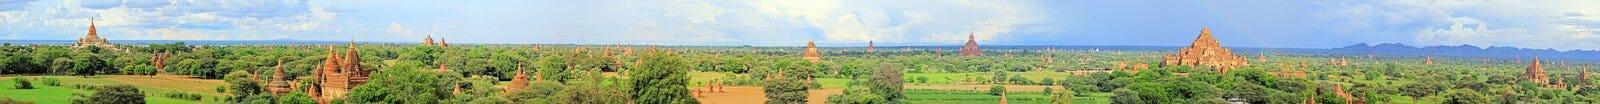 Bagan考古学区域全景,缅甸 免版税库存照片